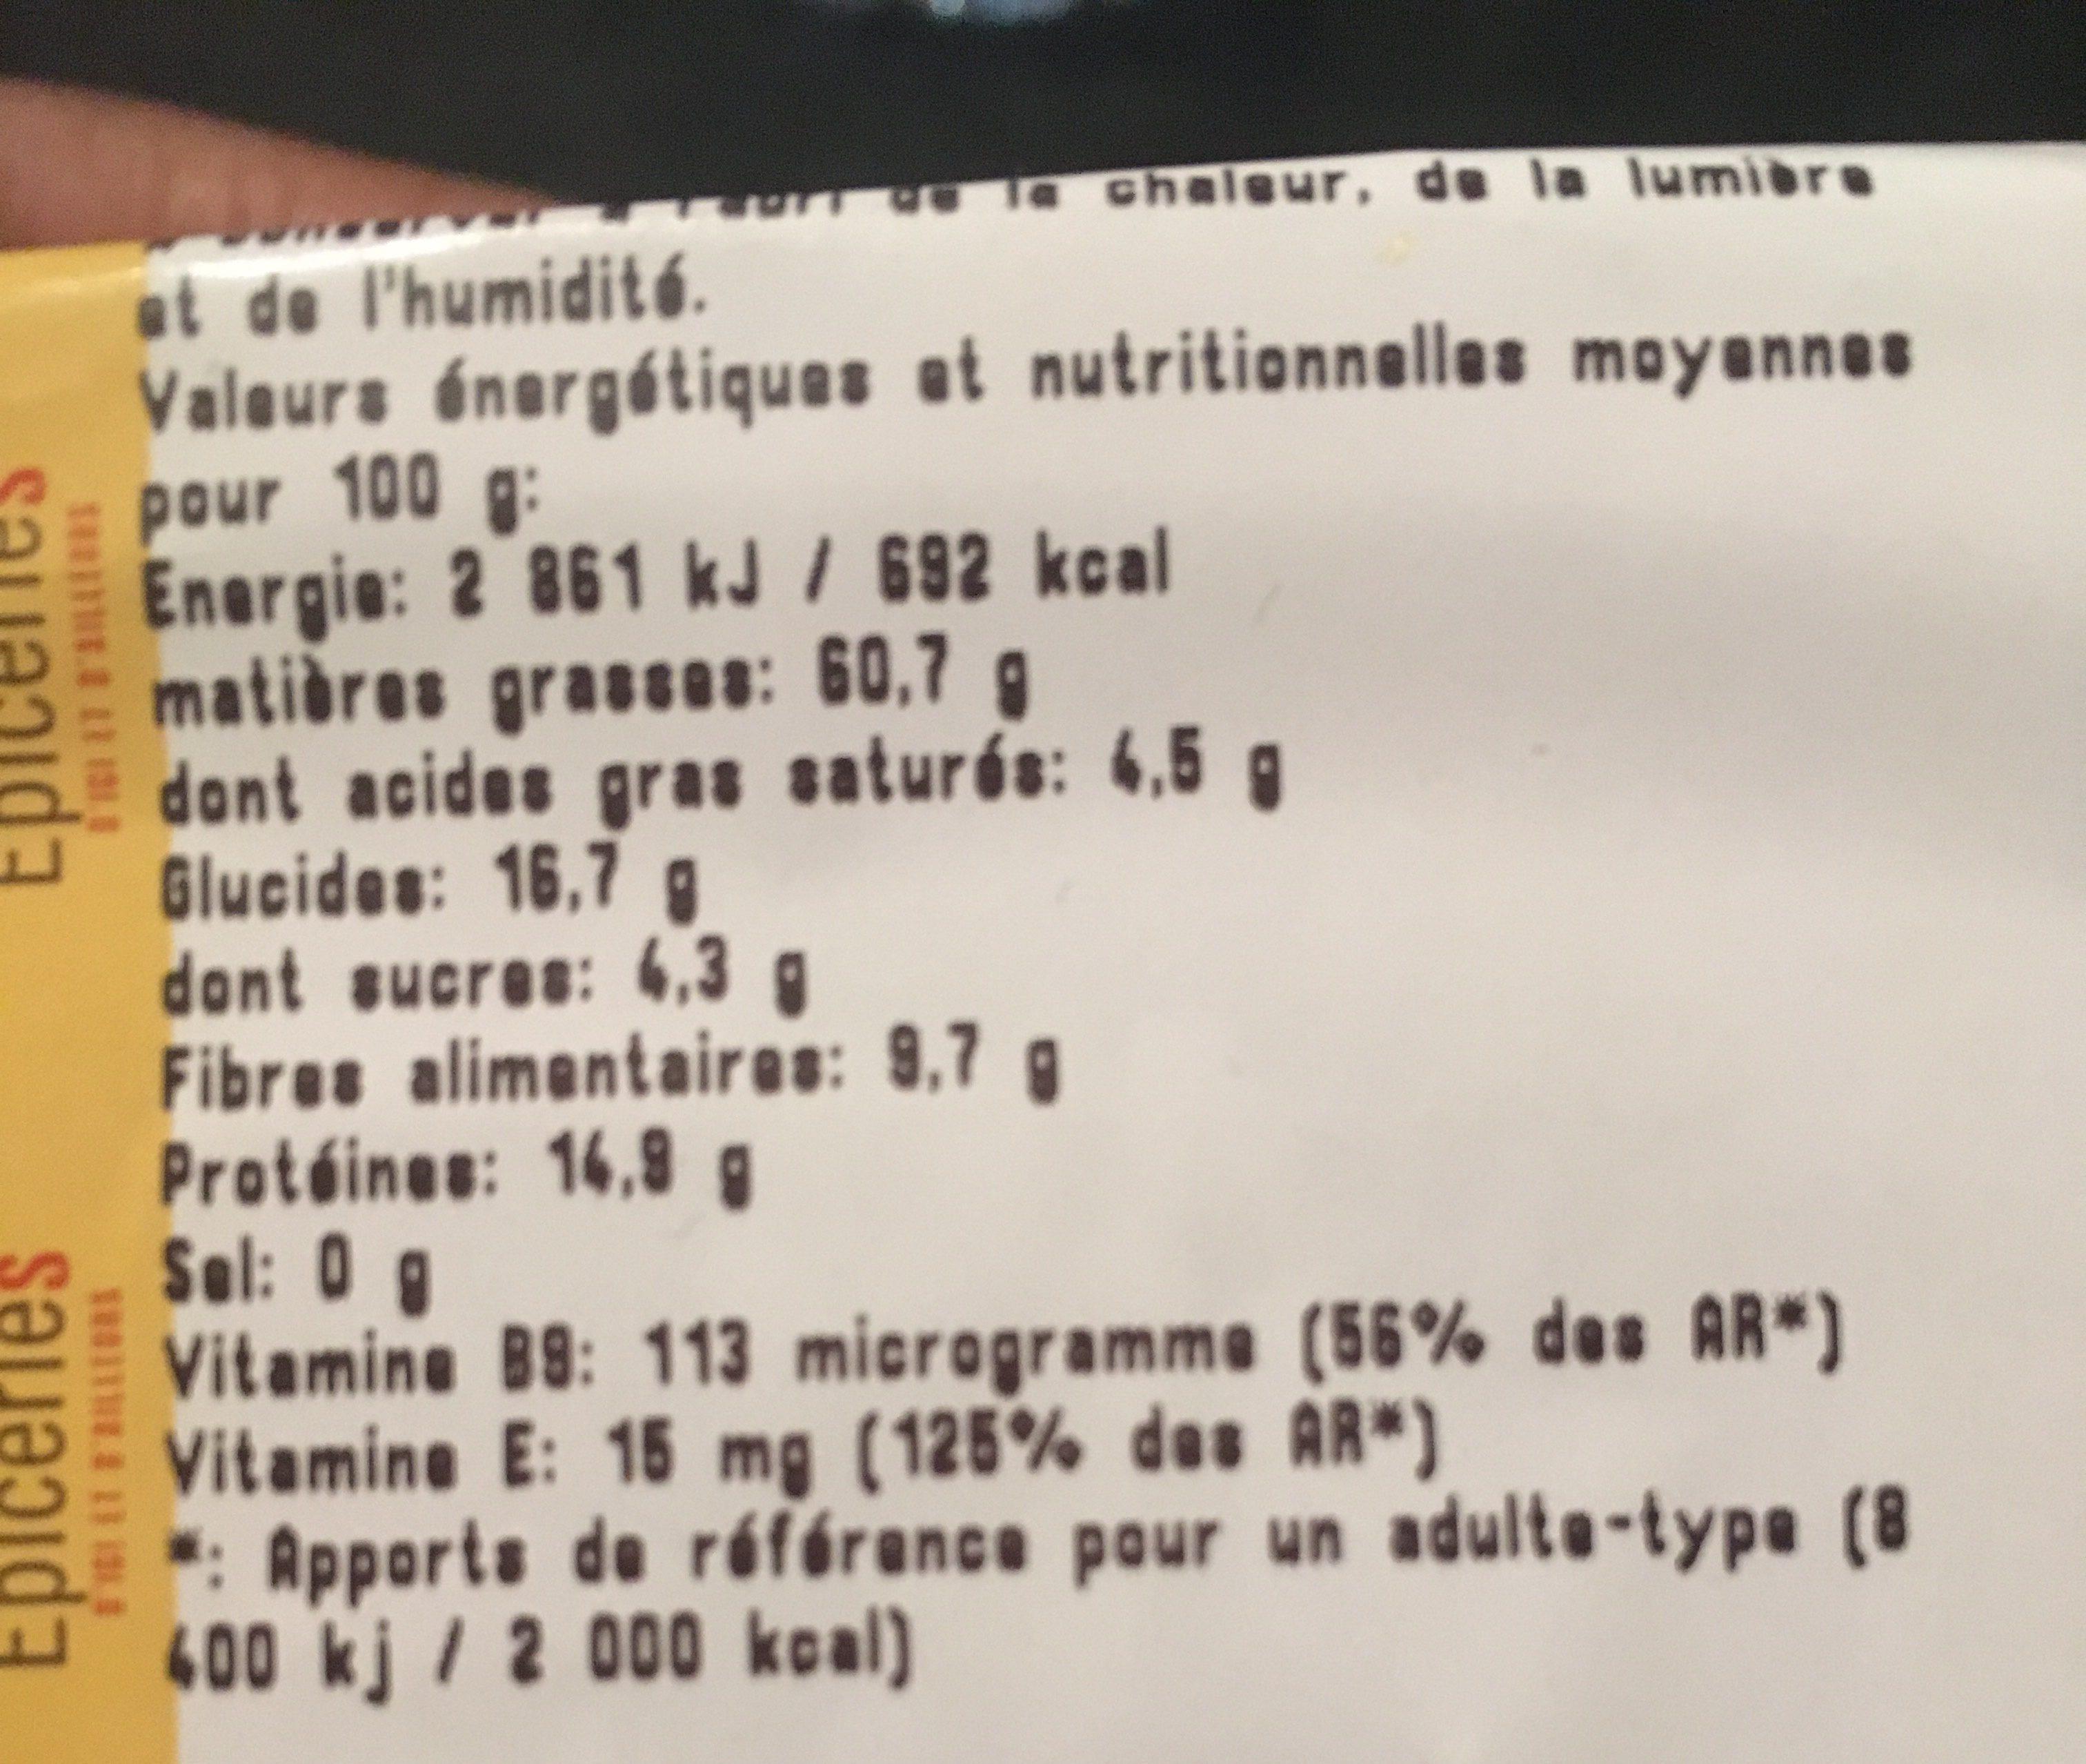 Noisette decortiquées - Ingrediënten - fr